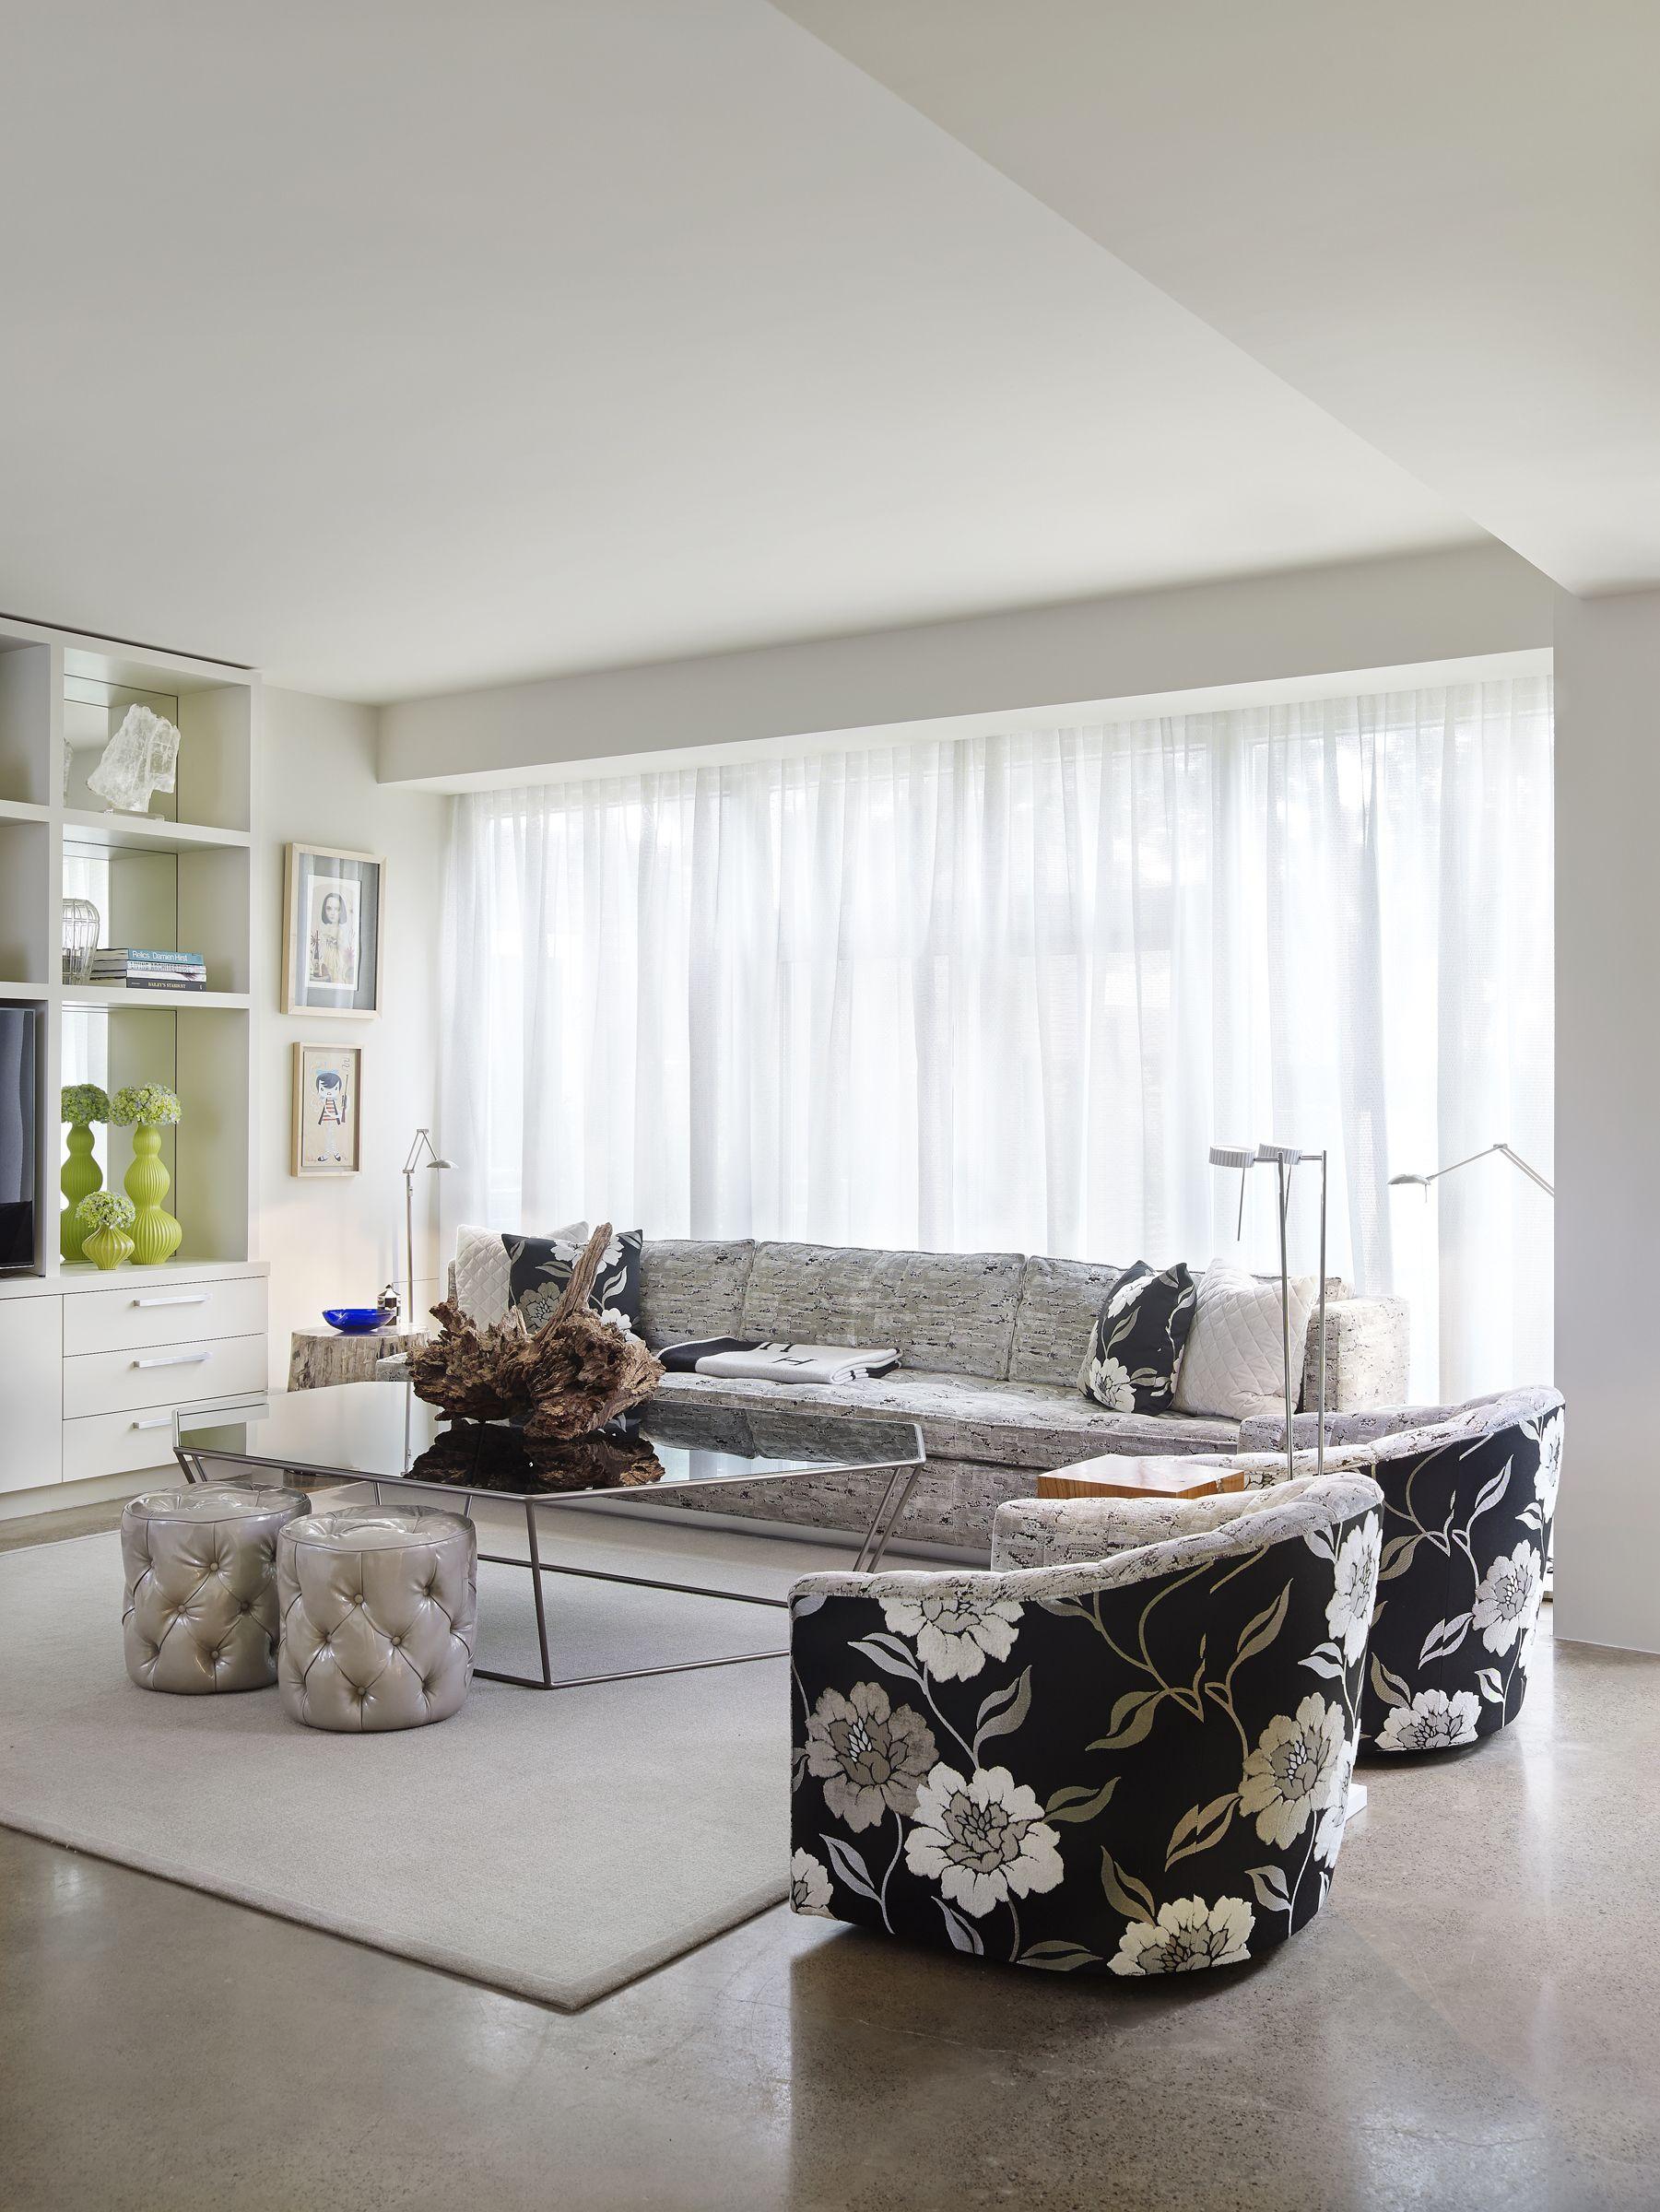 Custom Sofa, Channel Back York Chairs U0026 Tufted Stools | Cc: Alice Cottrell Good Ideas